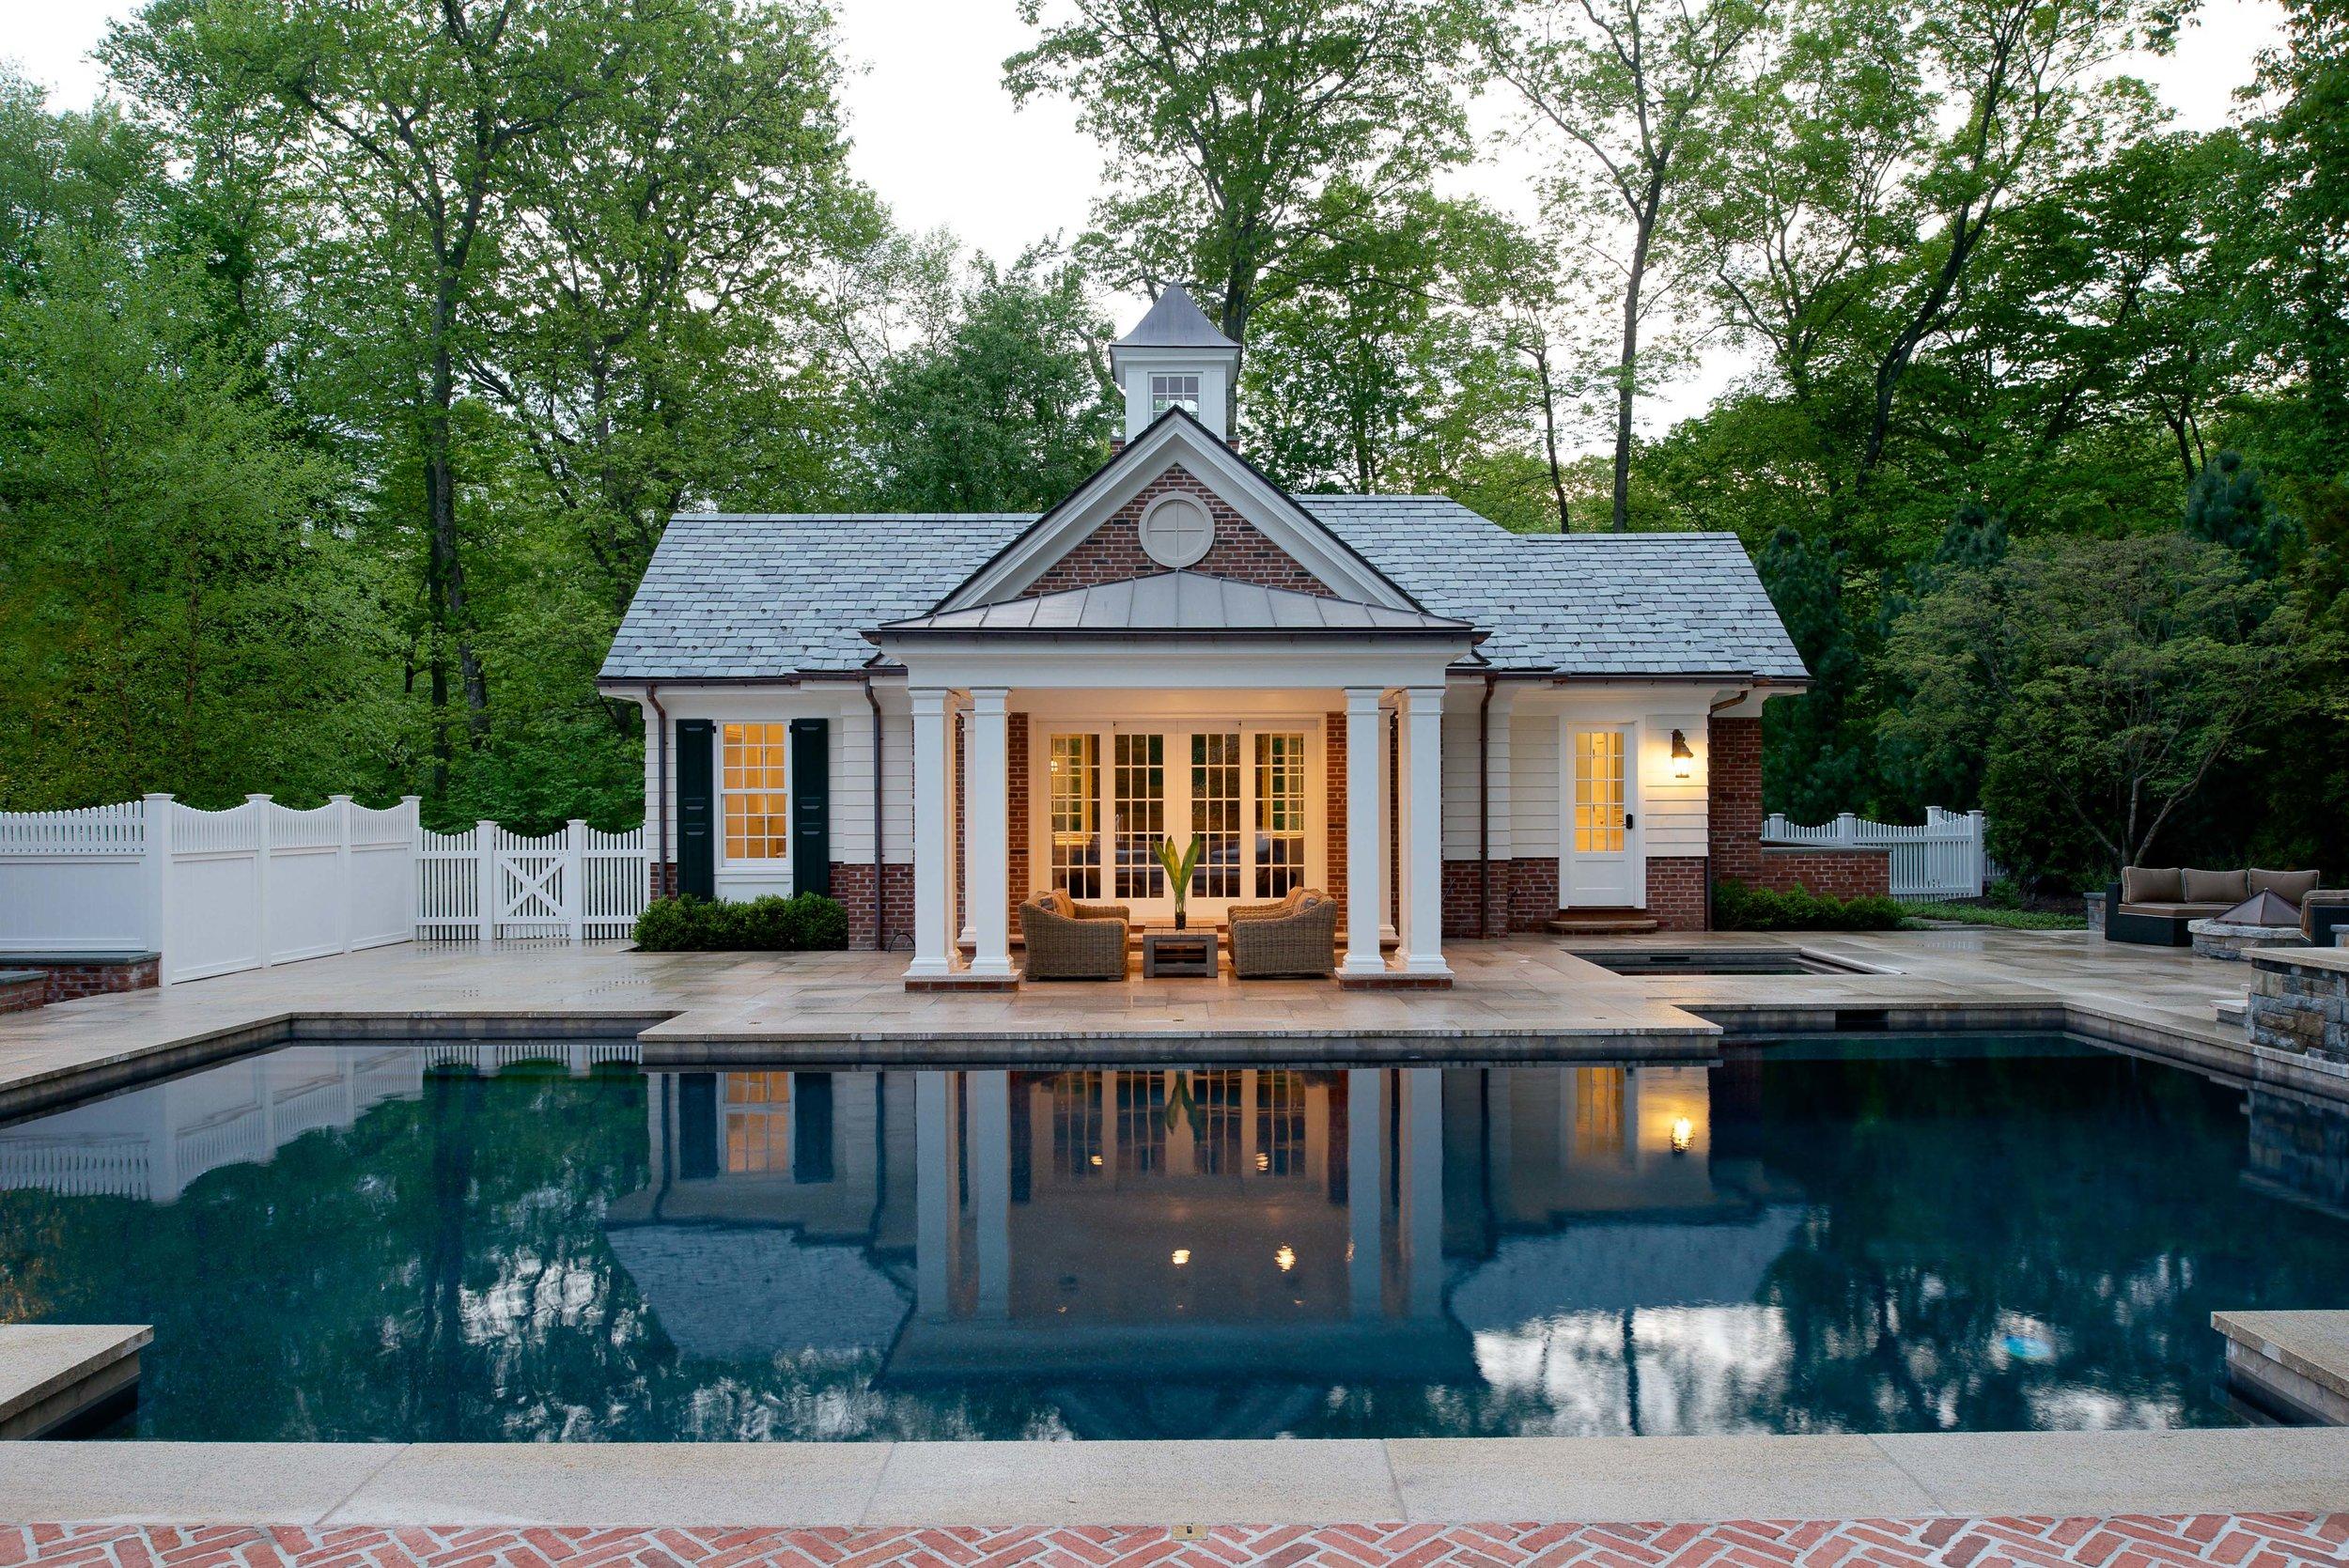 Pool house at dusk